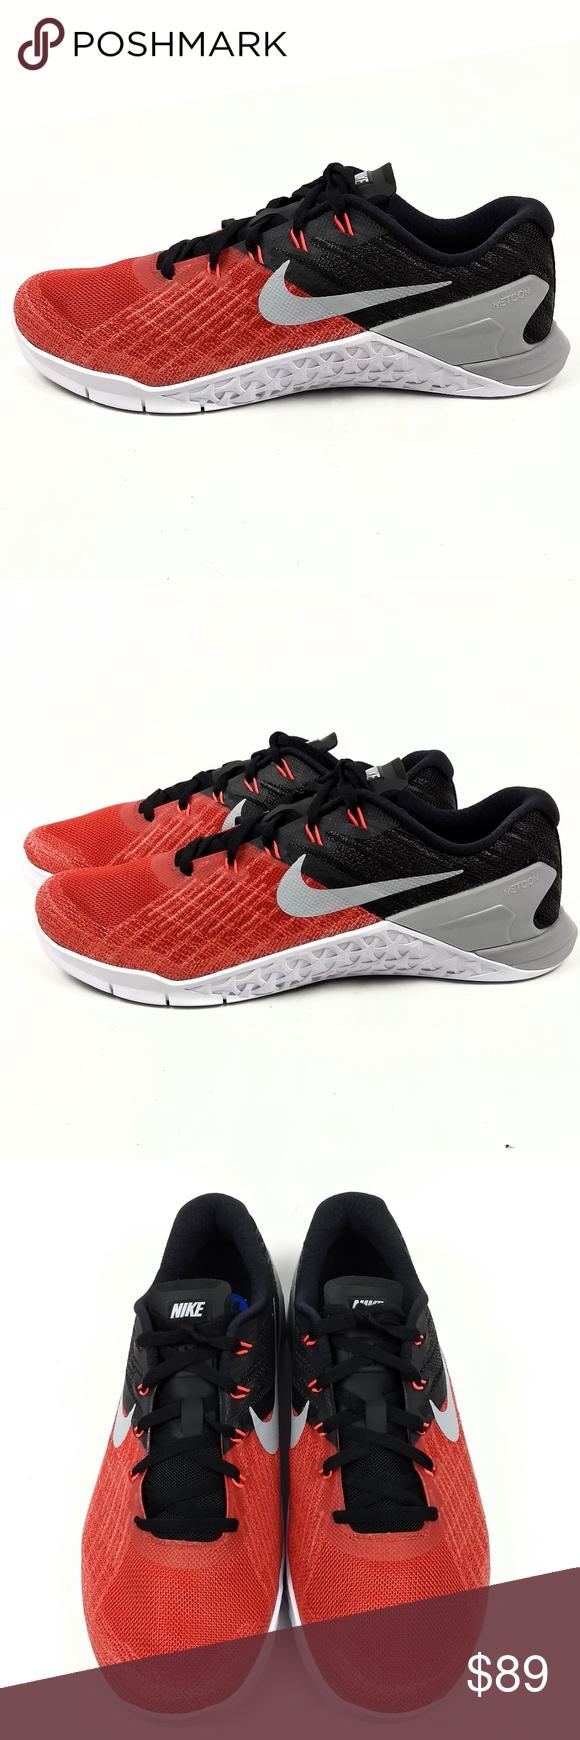 Nike Metcon 3 Training-Gewichtheberschuhe Gr. 7.5 Nike Metcon 3 Training-Gewichtheberschuhe Farbe: U...